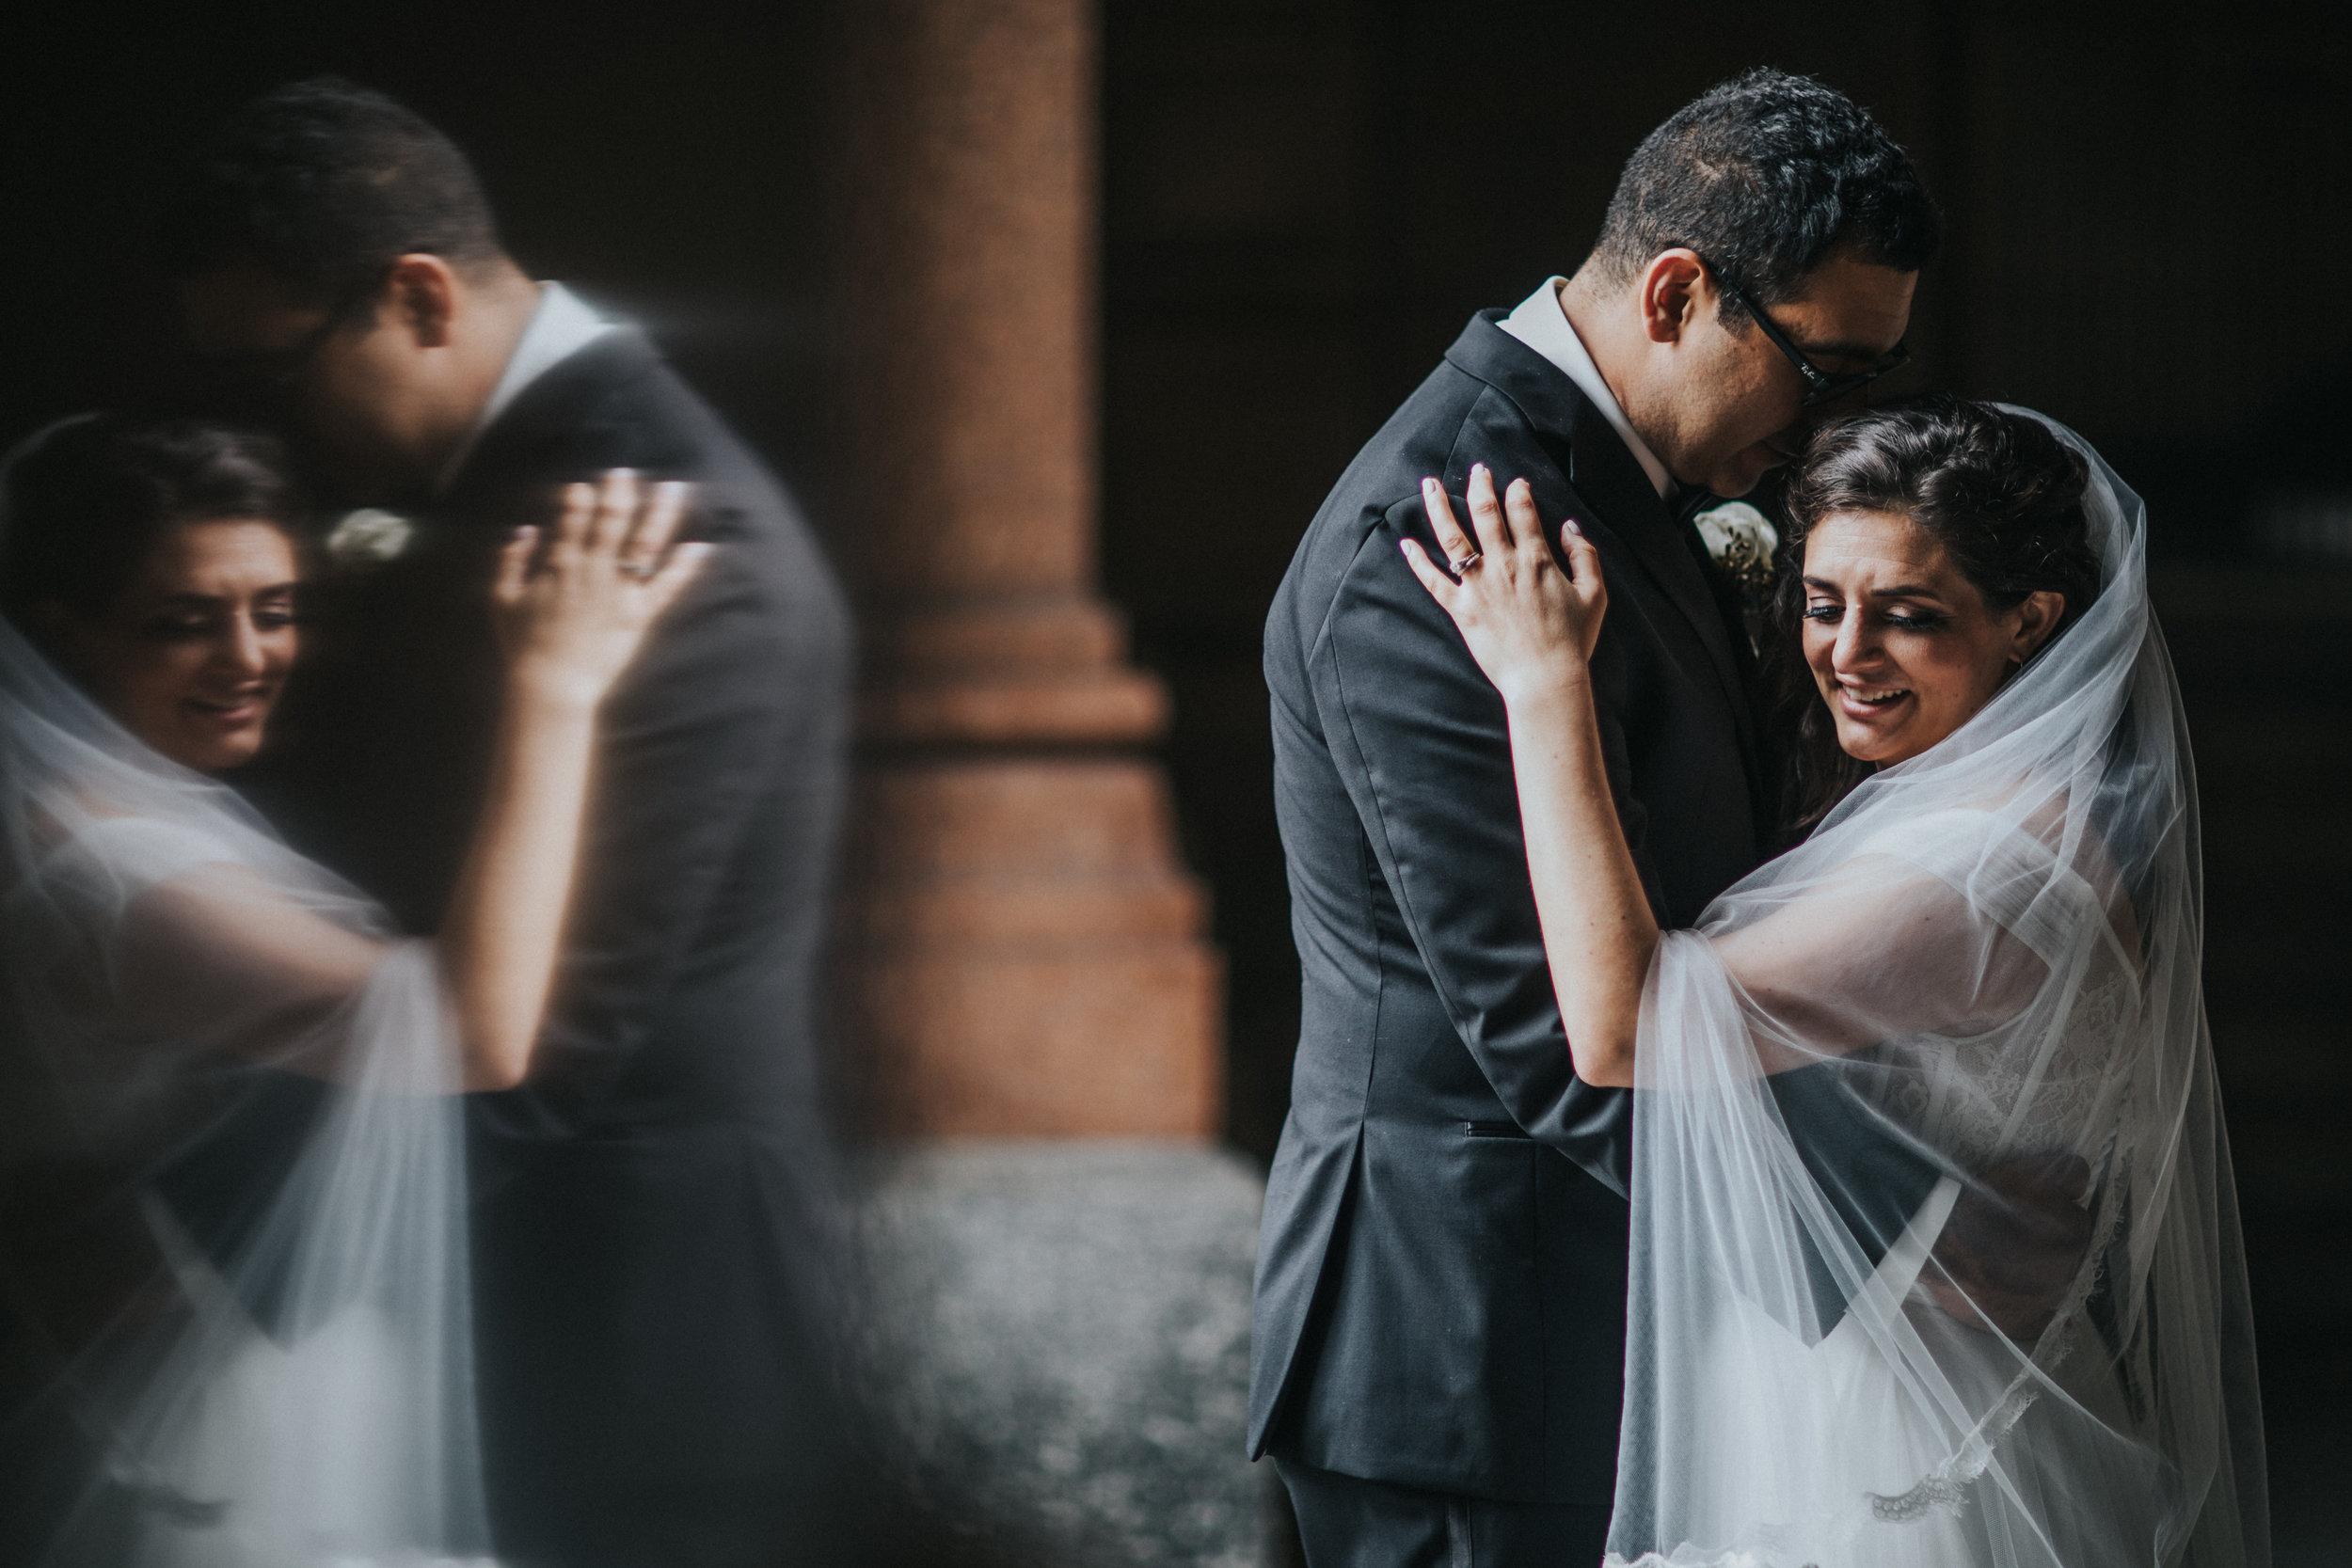 JennaLynnPhotography-NJWeddingPhotographer-Philadelphia-Wedding-ArtsBallroom-BridalParty-67.jpg